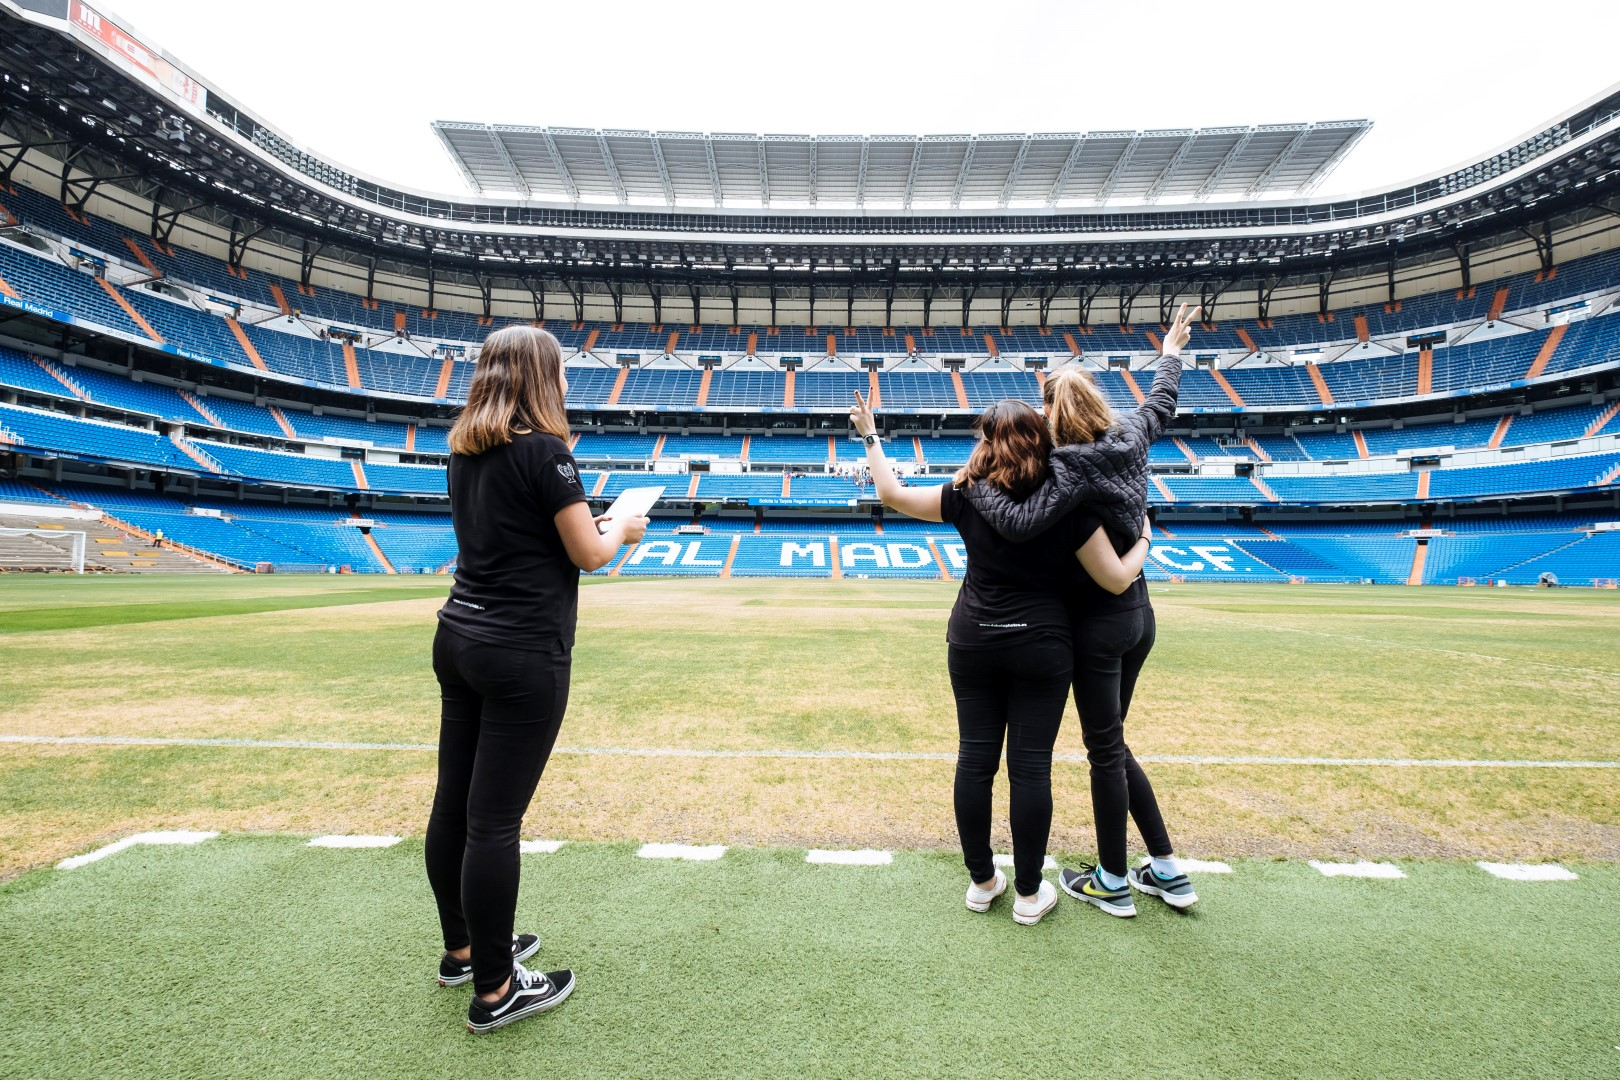 Real-Madrid_10.JPG